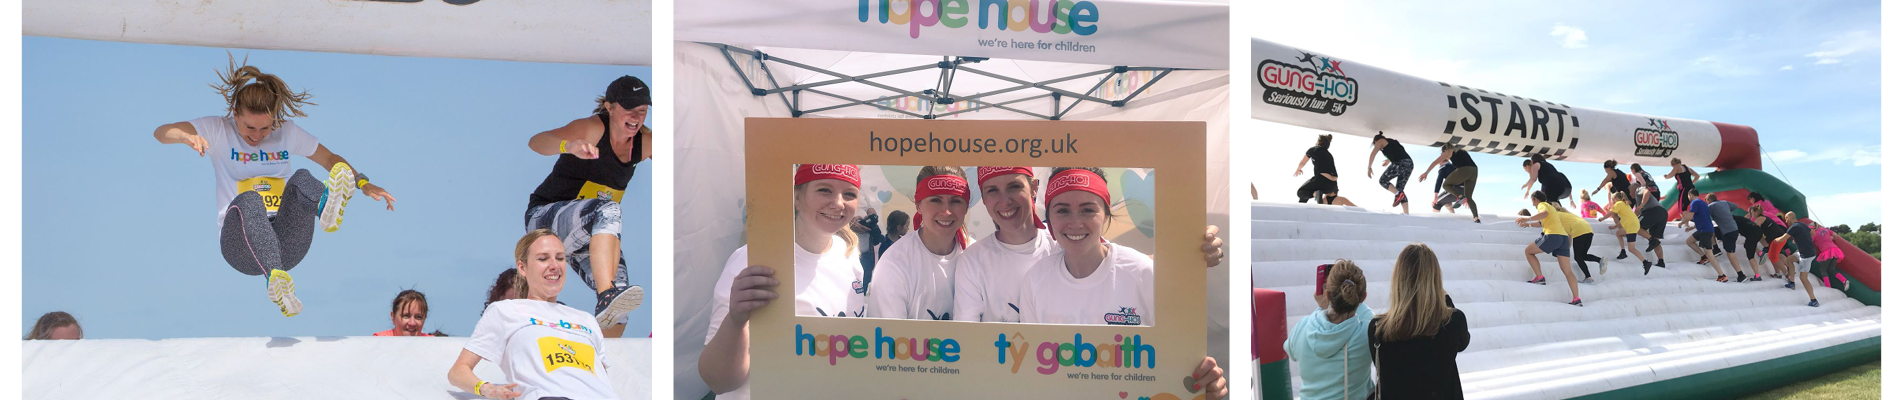 Team Entyce tackles Gung-Ho for Hope House